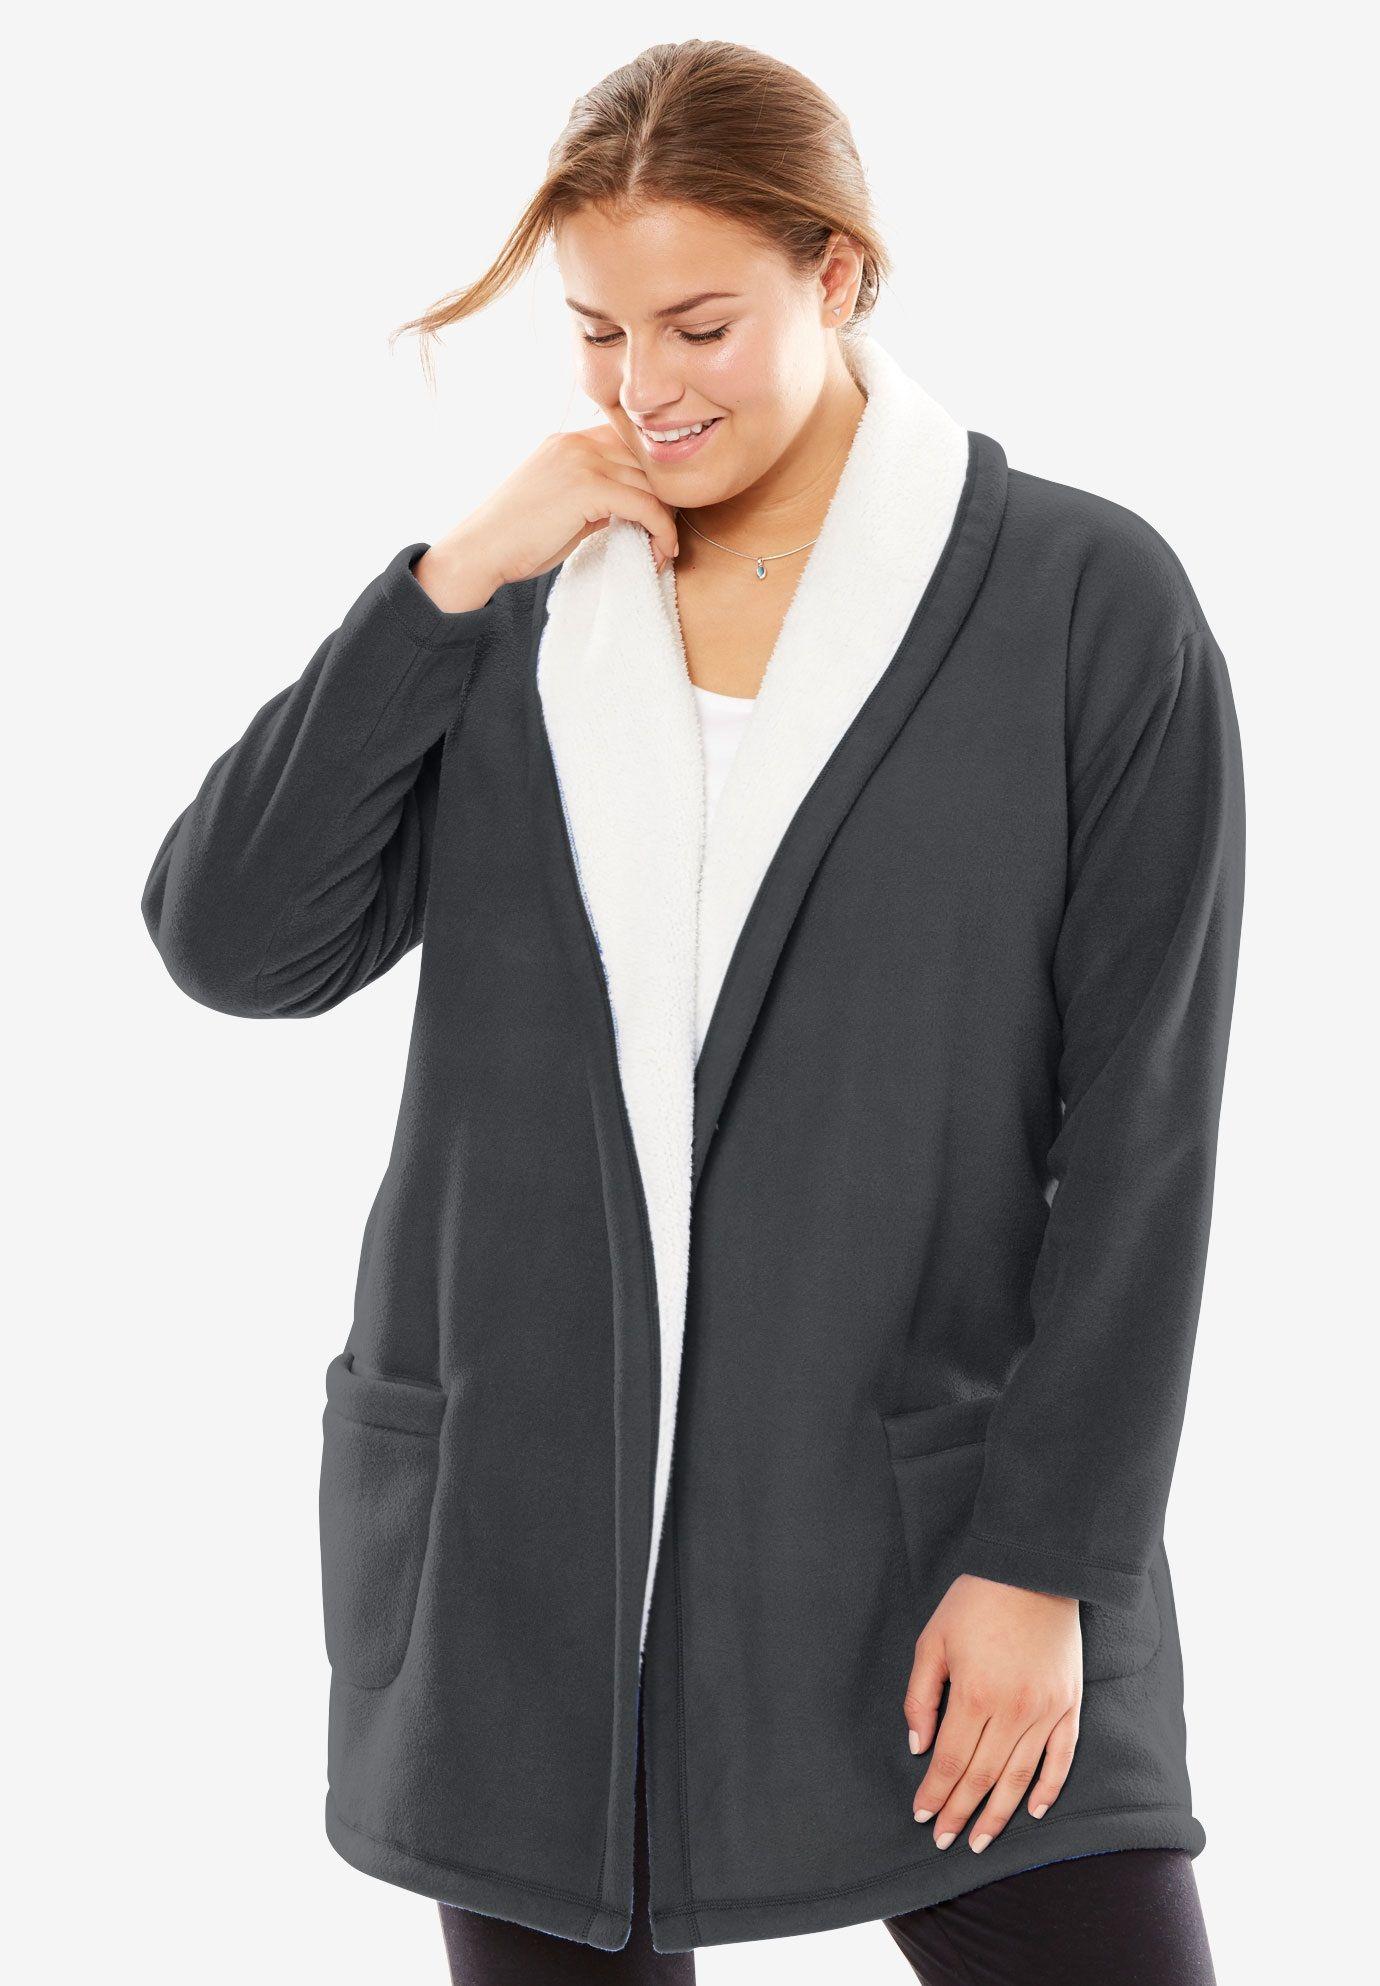 3febad0aeba1d4 Fleece Bed Jacket by Dreams & Co.®, $26.99 | * * * BUY - Absolutely ...